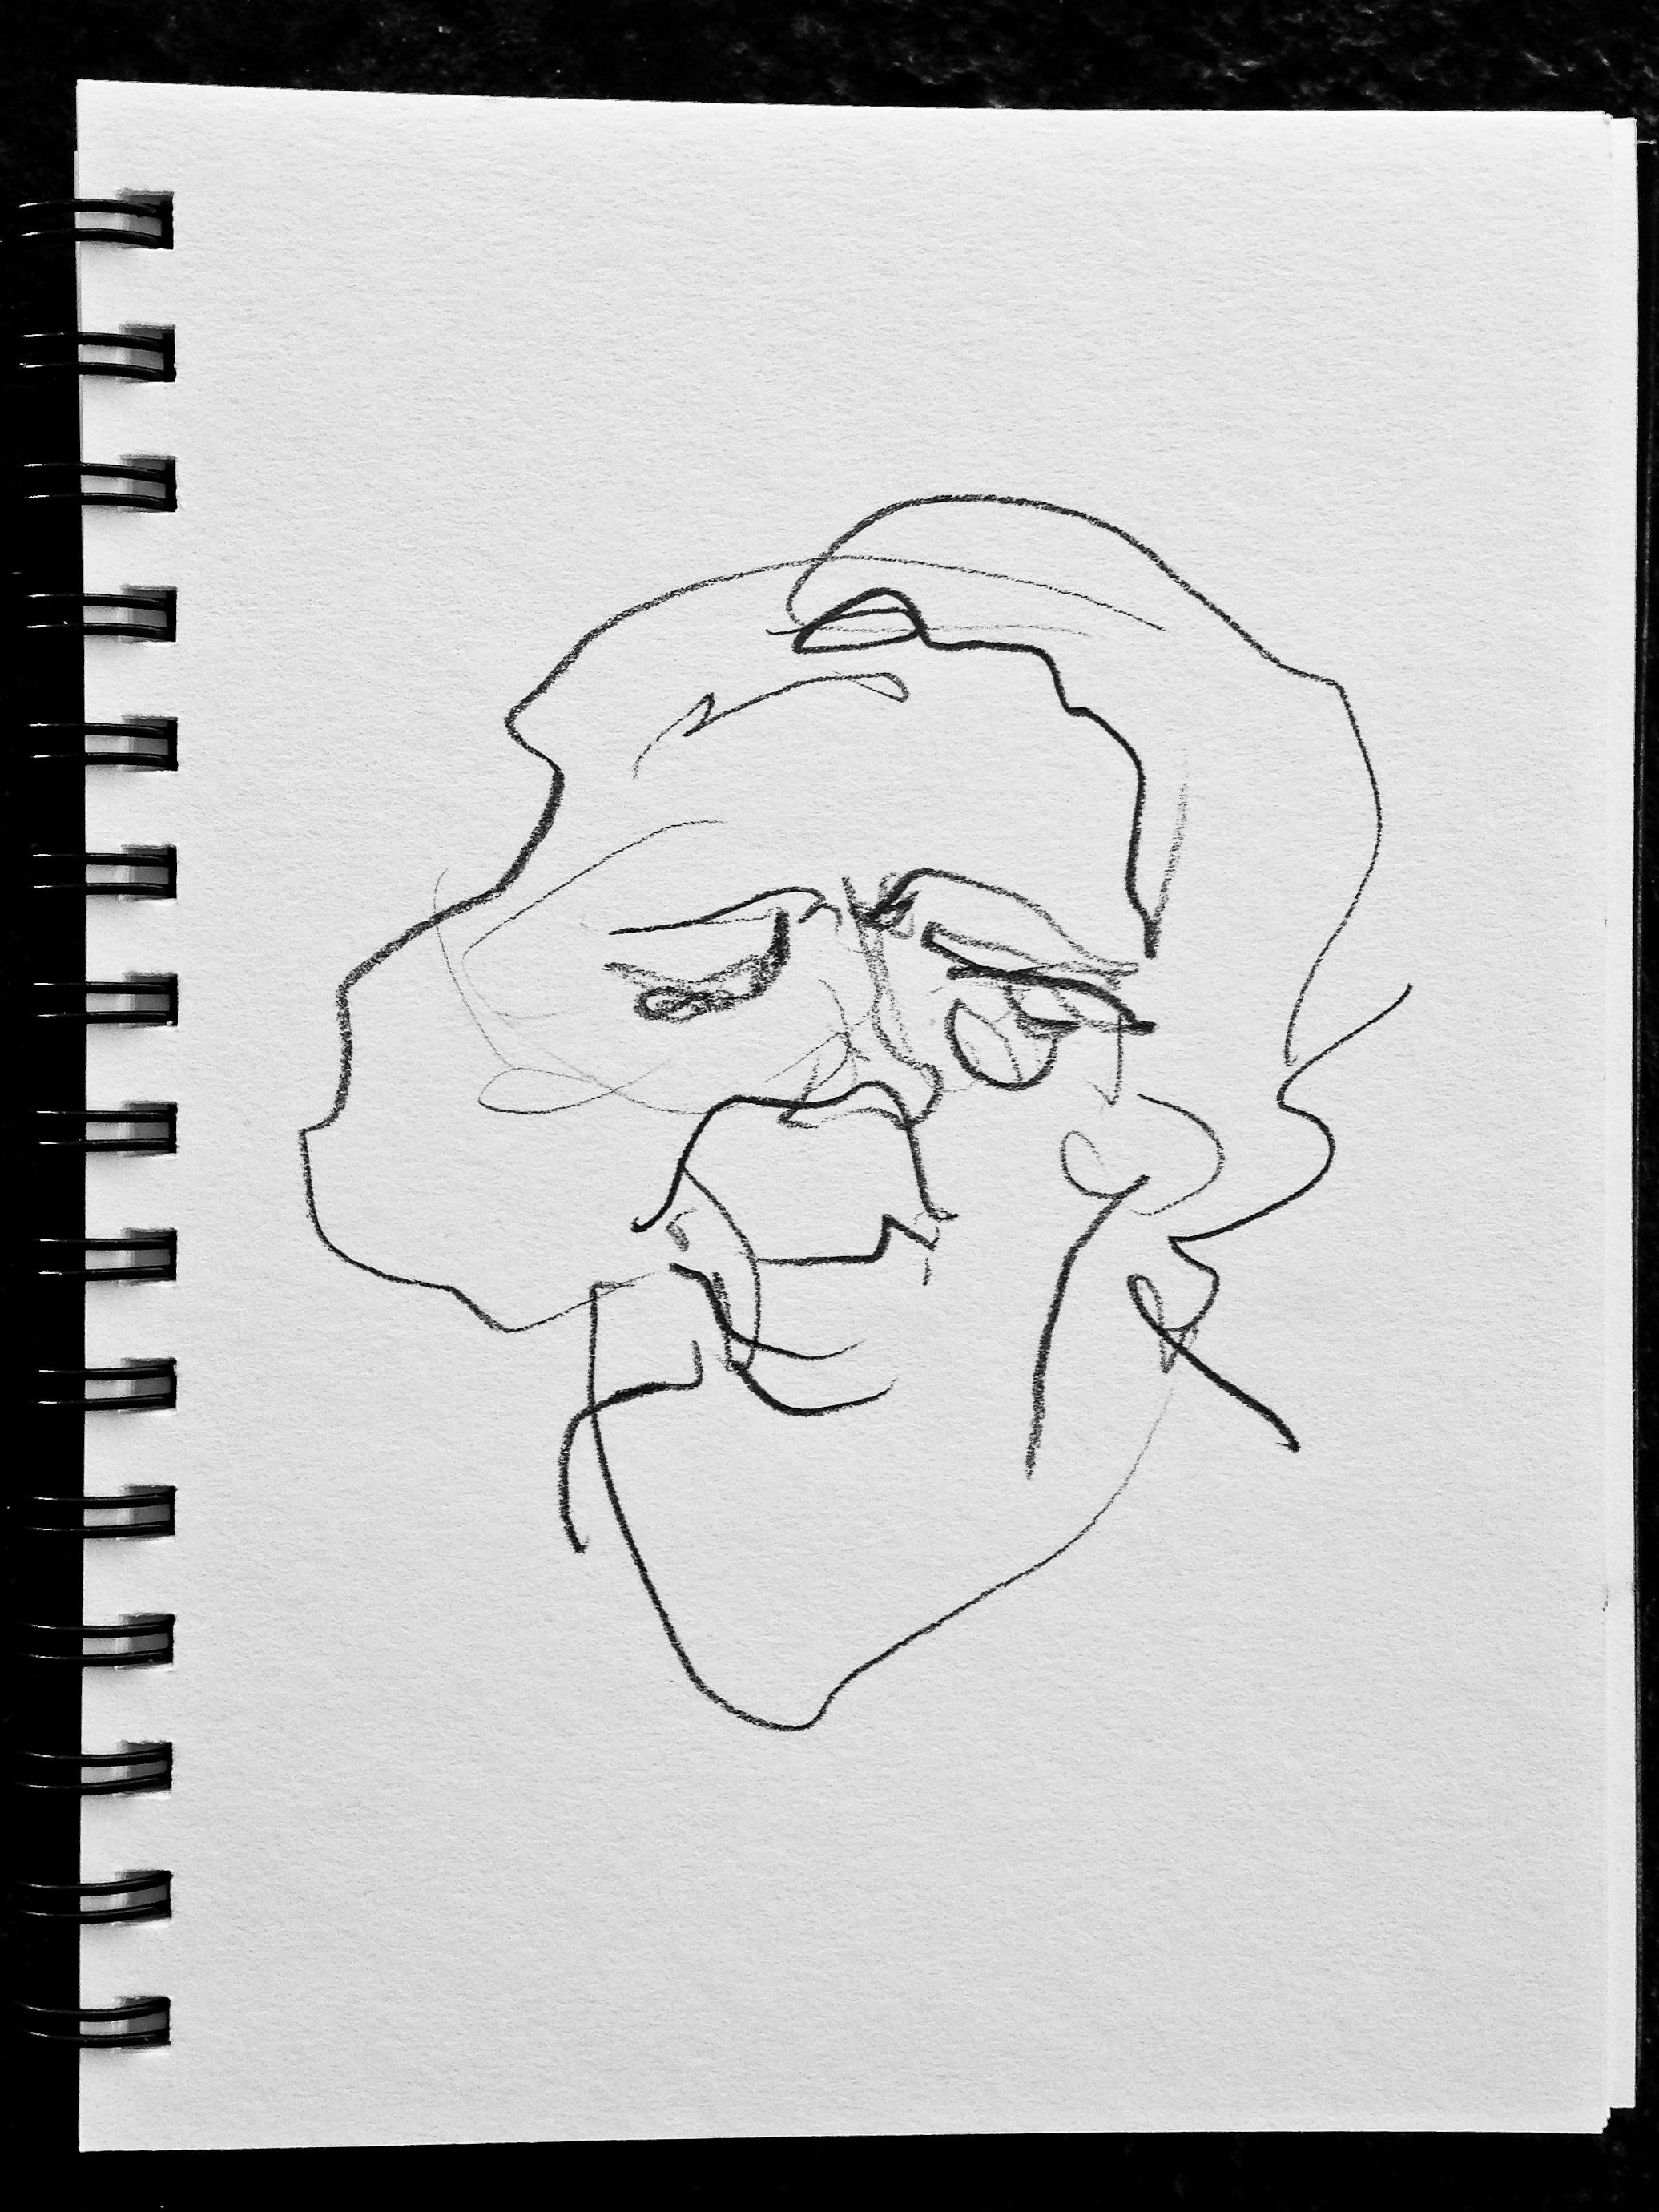 paula-west-sketch-4183